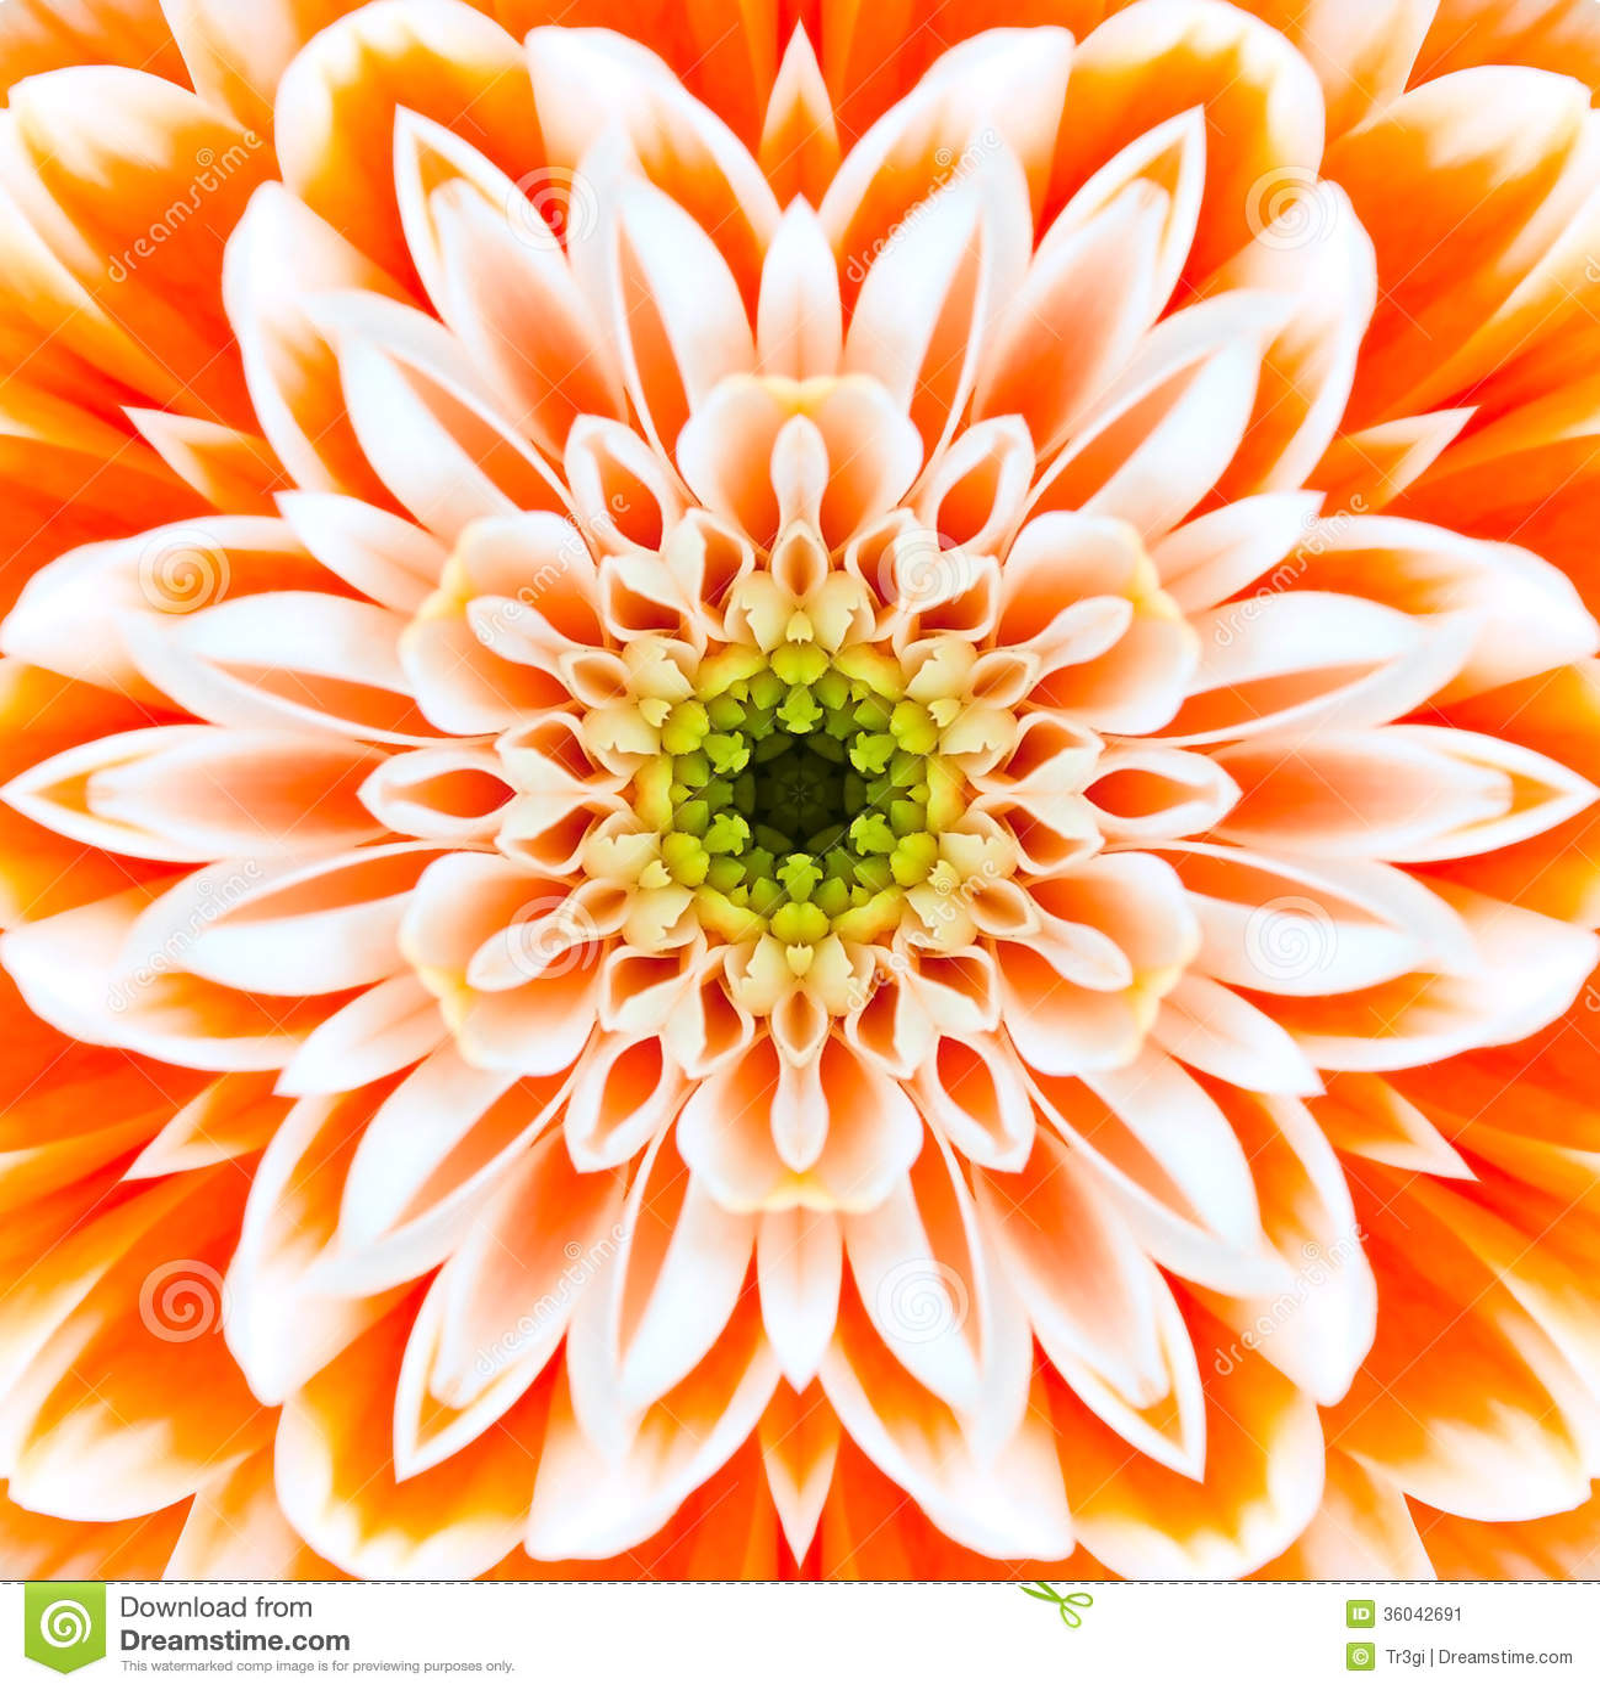 Orange Concentric Flower Center. Mandala Kaleidoscopic